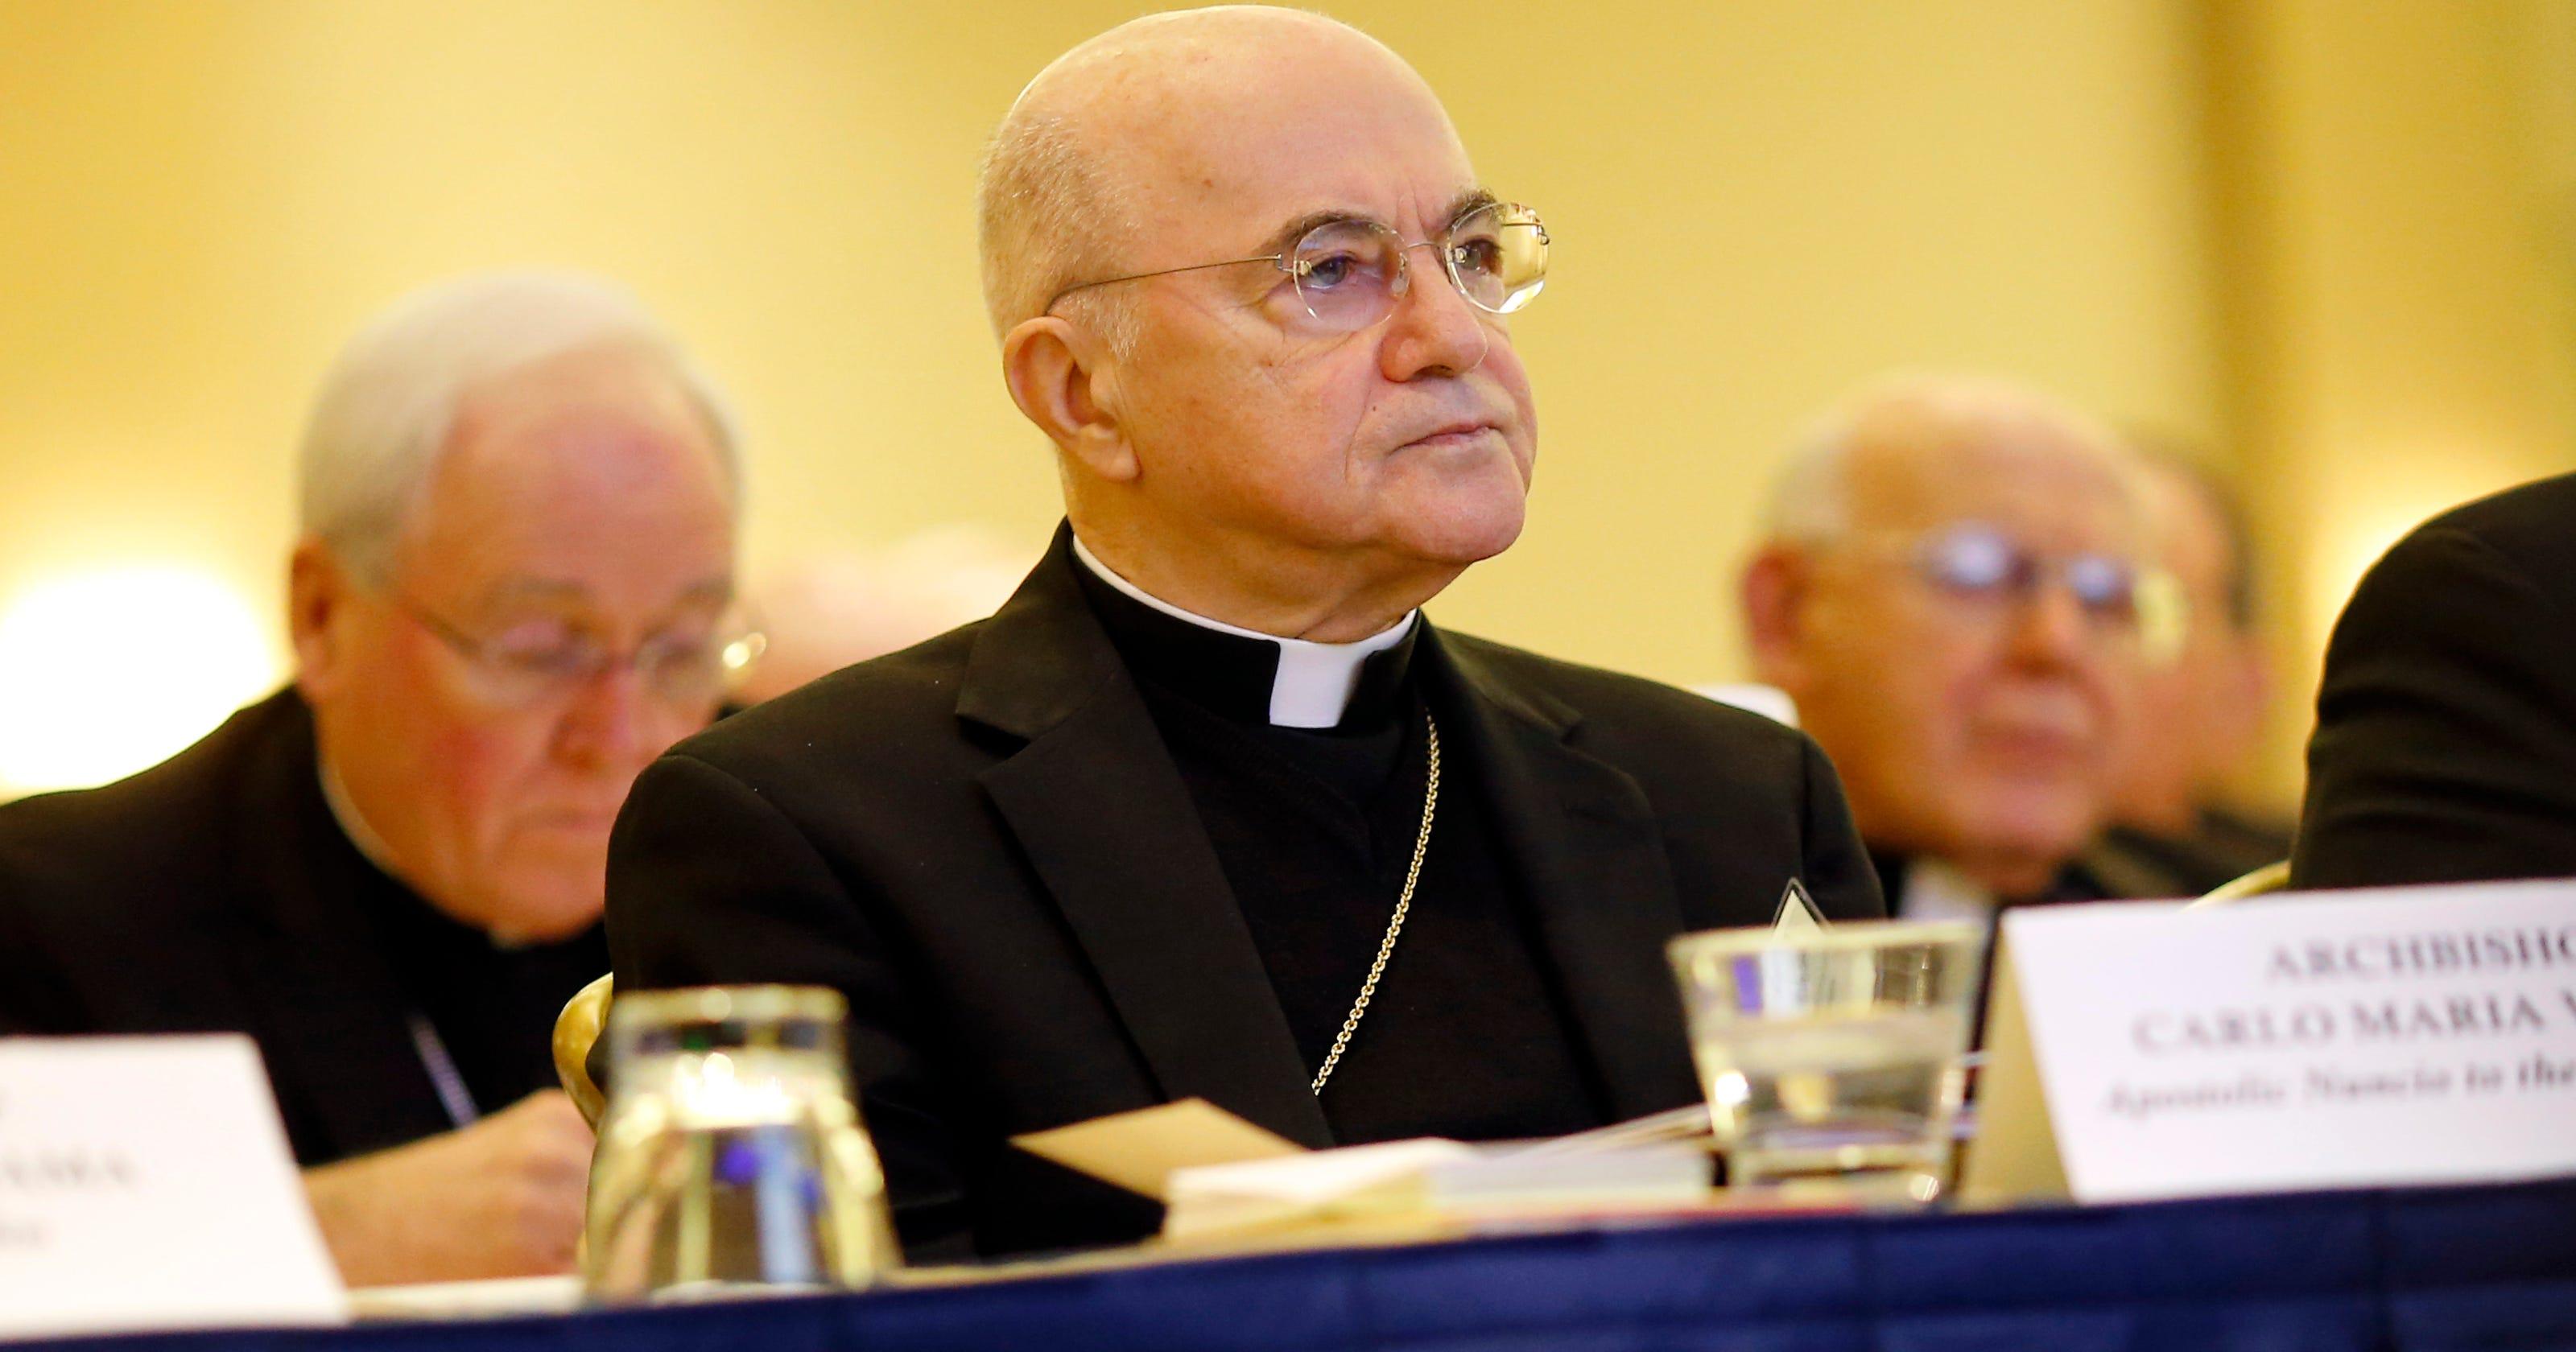 Bishops Applaud Official Behind Pope Davis Meet